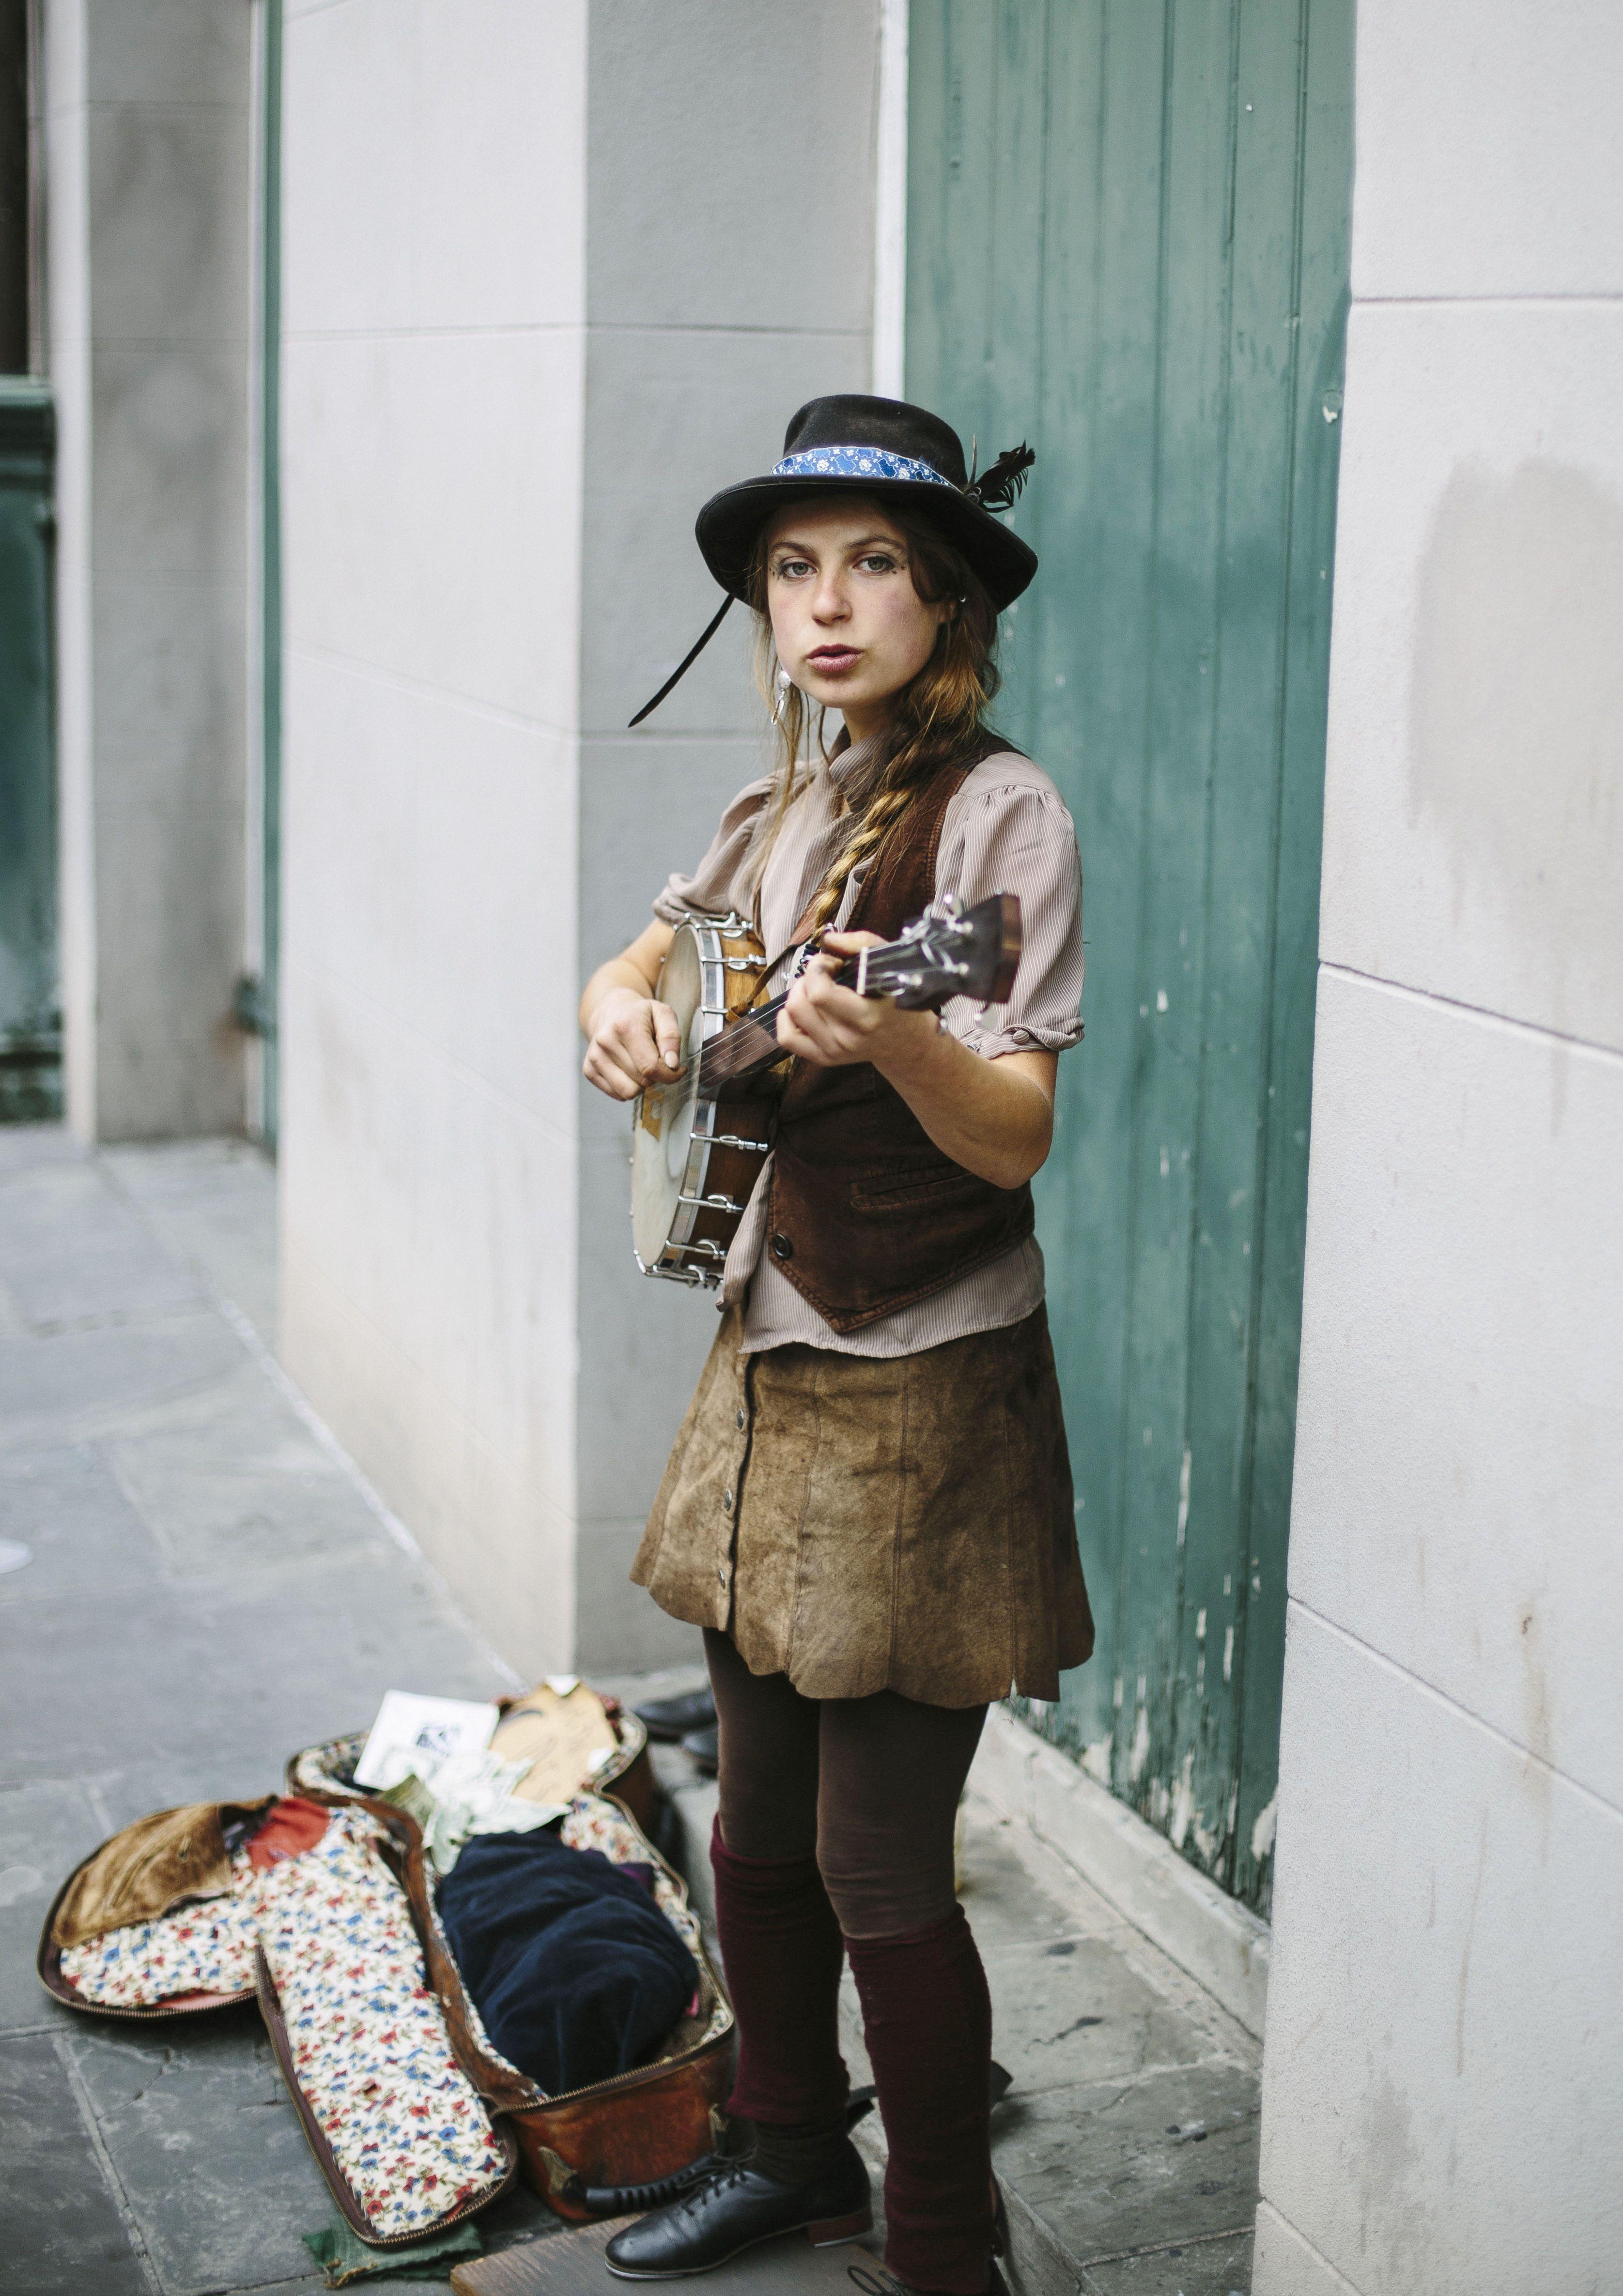 Street Performer Kia Ochun - New Orleans